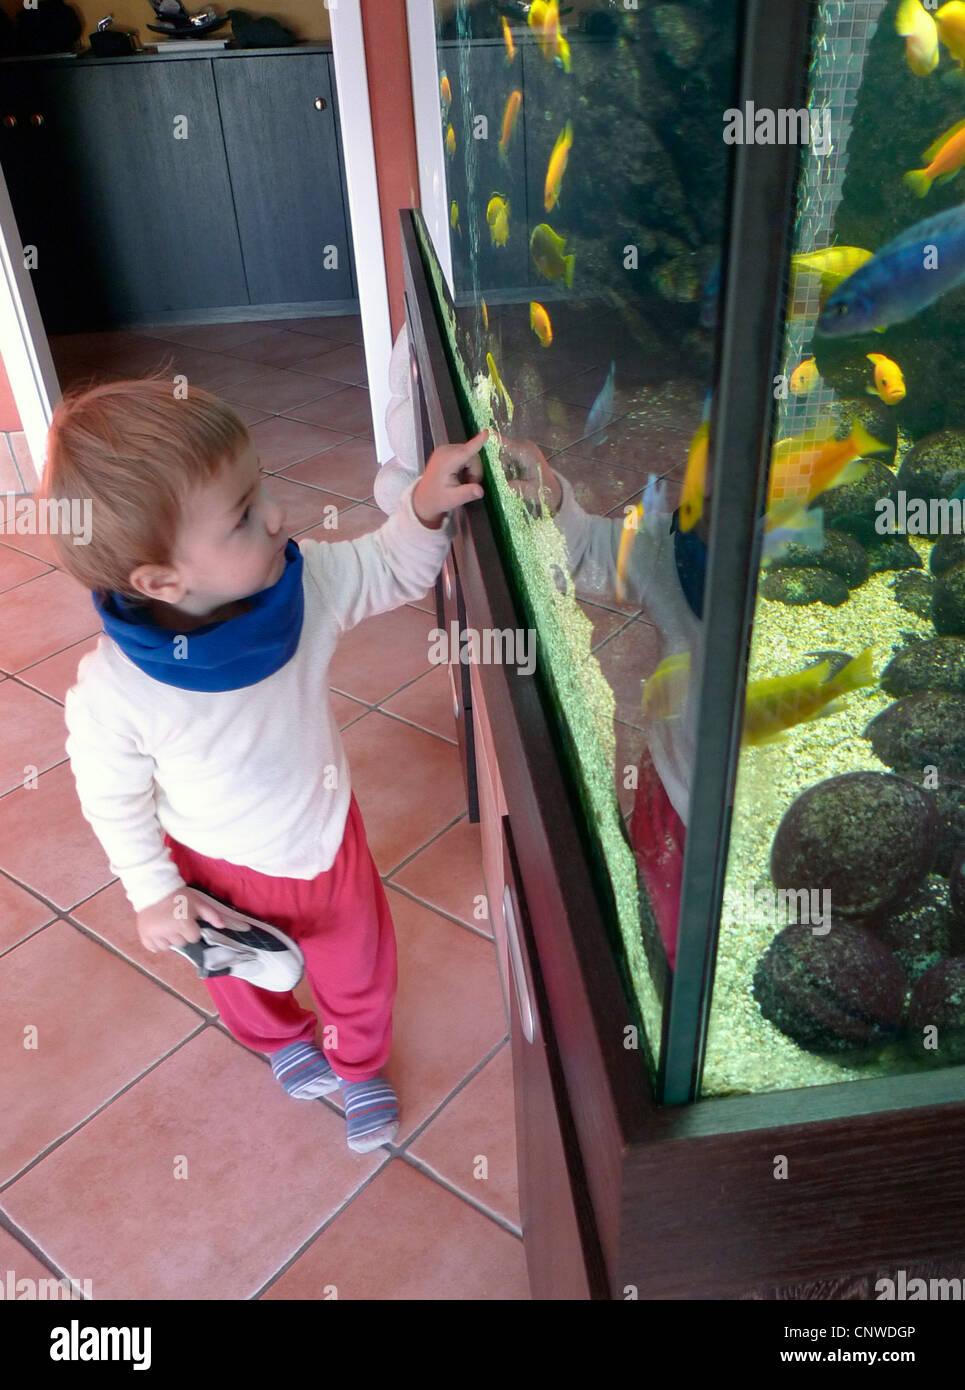 little boy at an aquarium - Stock Image